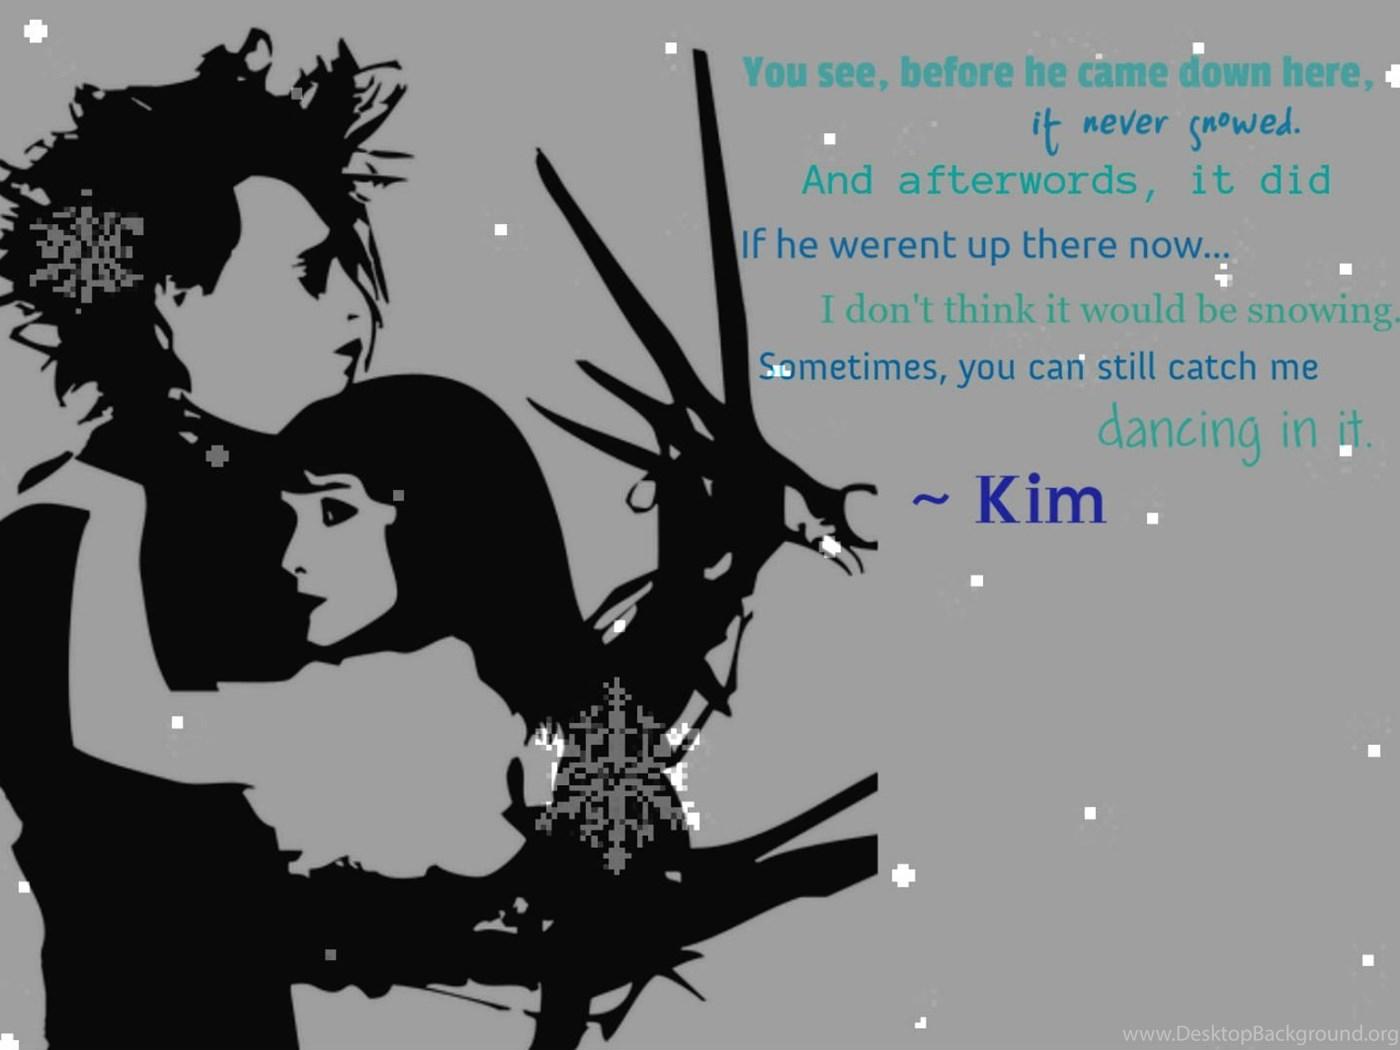 Edward Scissorhands Drama Fantasy Romance Depp Mood Love